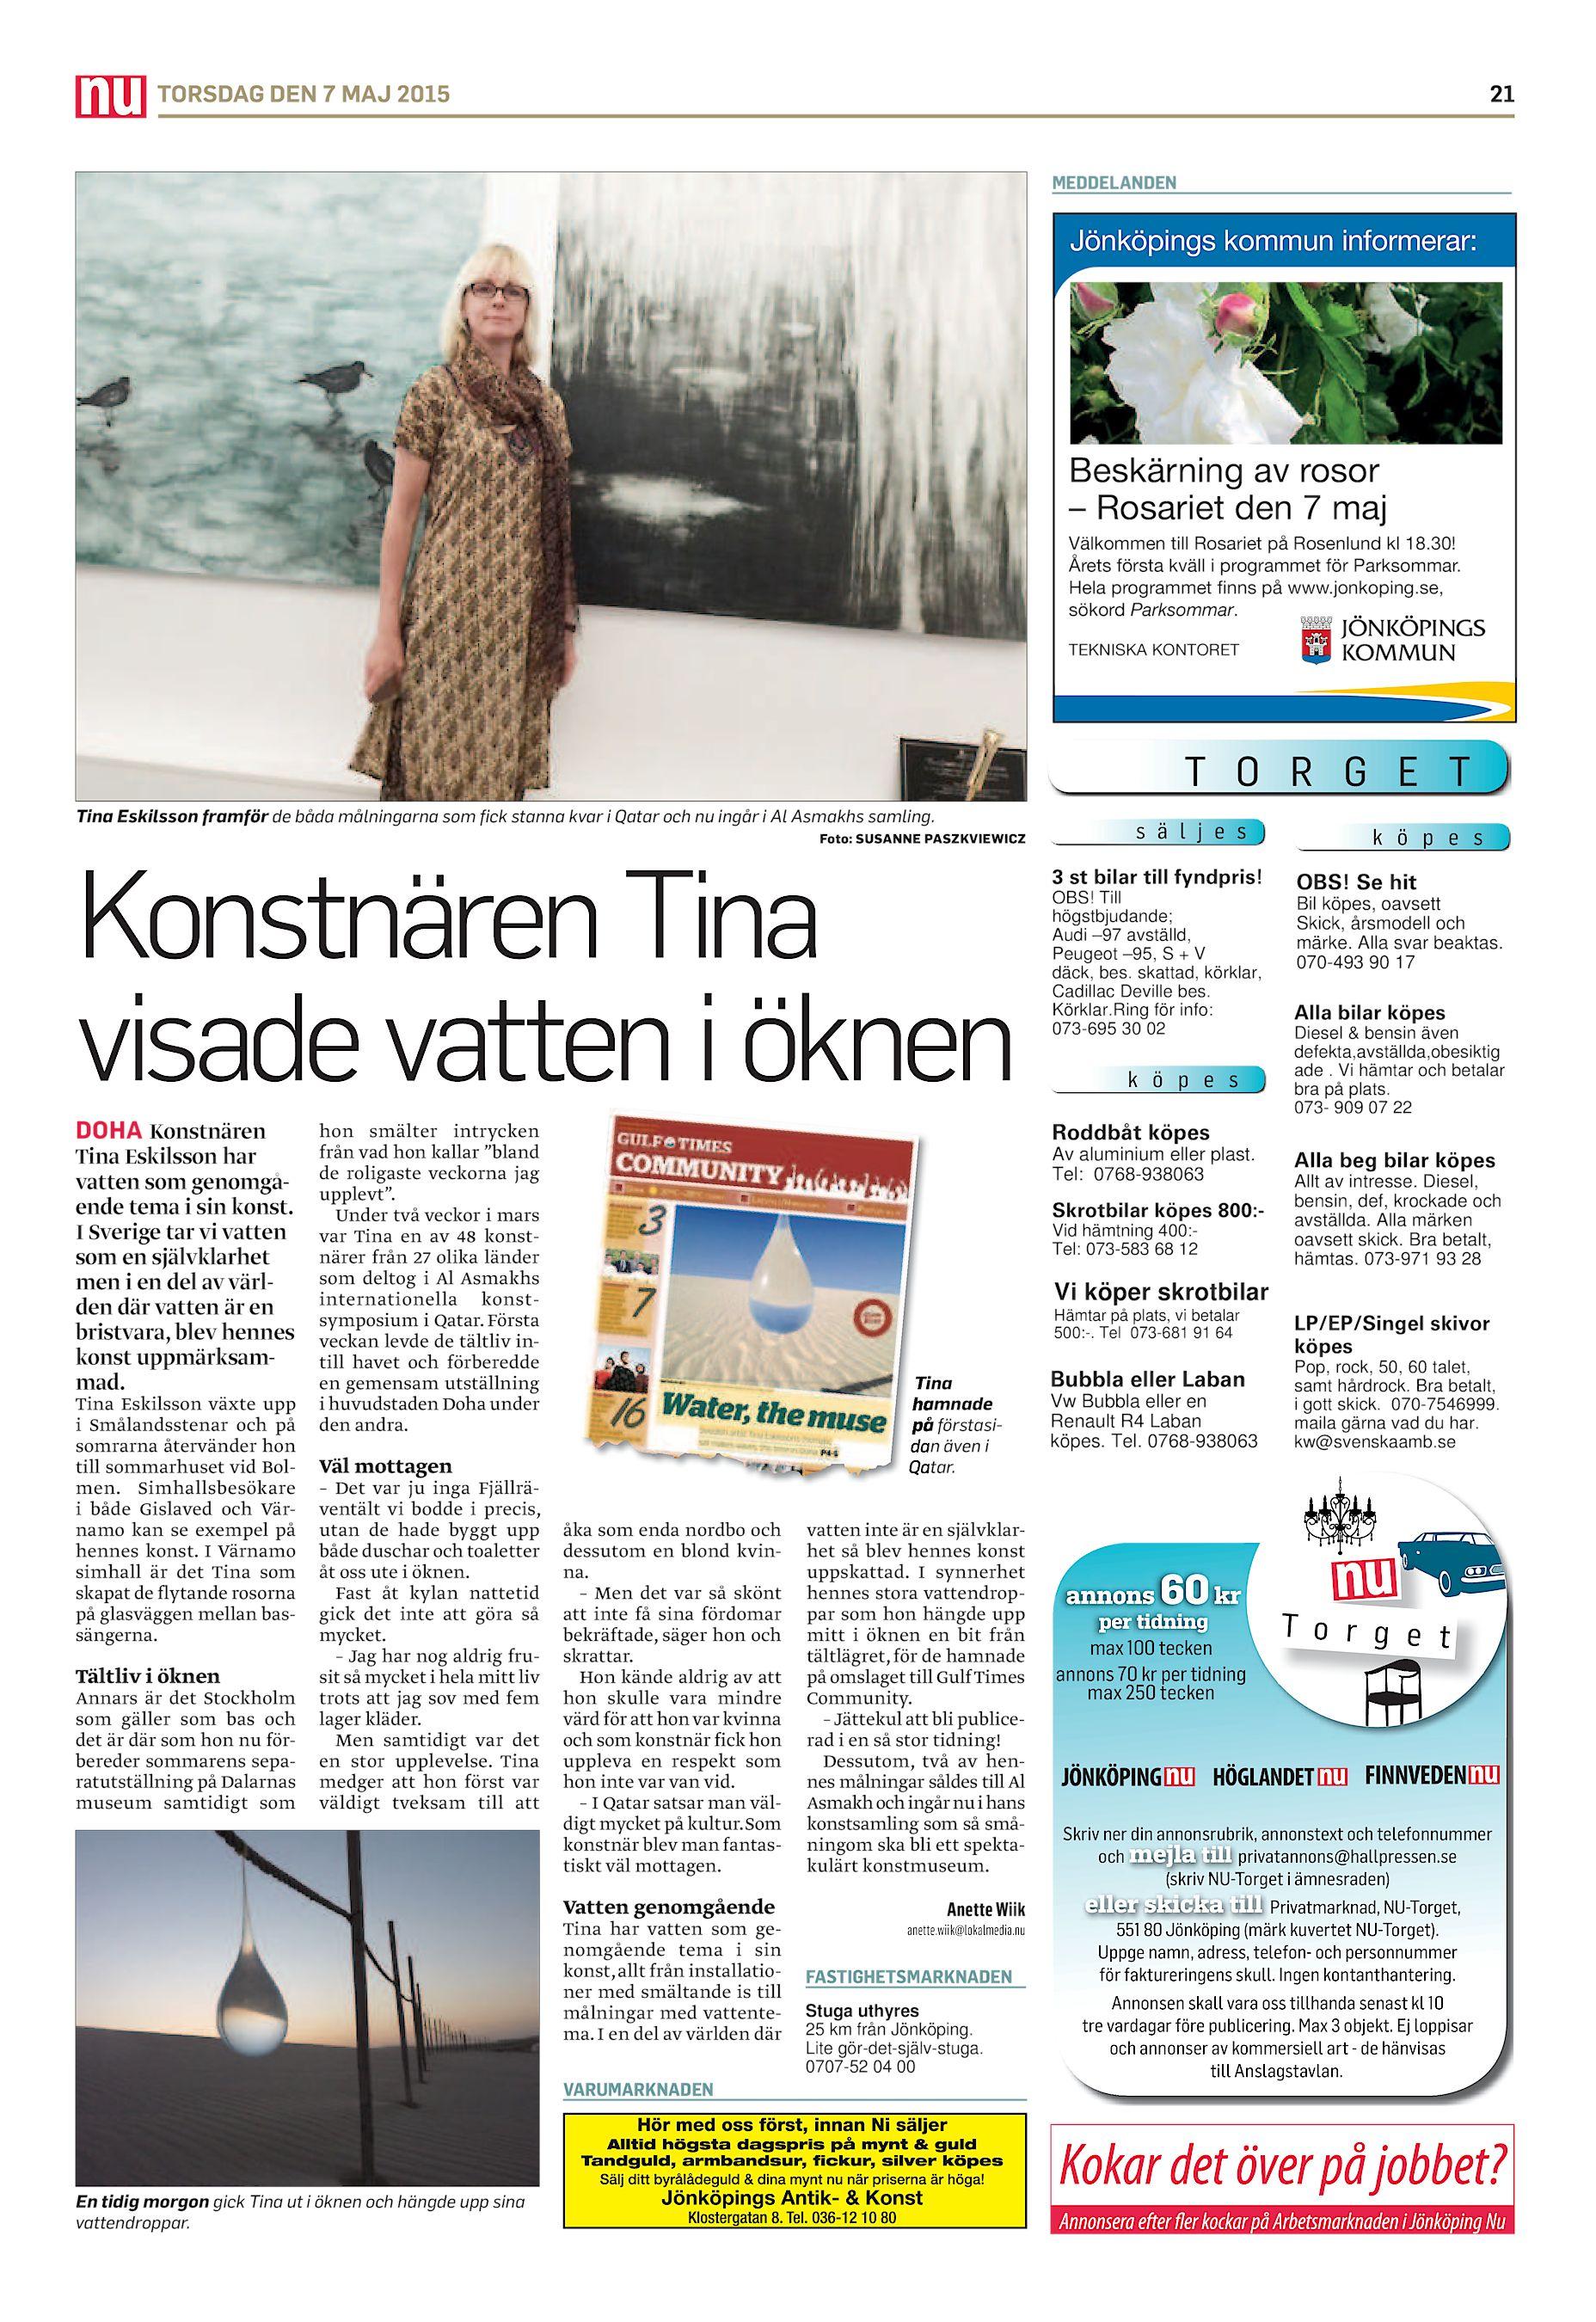 Gratis Sex Trffas Casual Apps Stora Mossen Trffa College